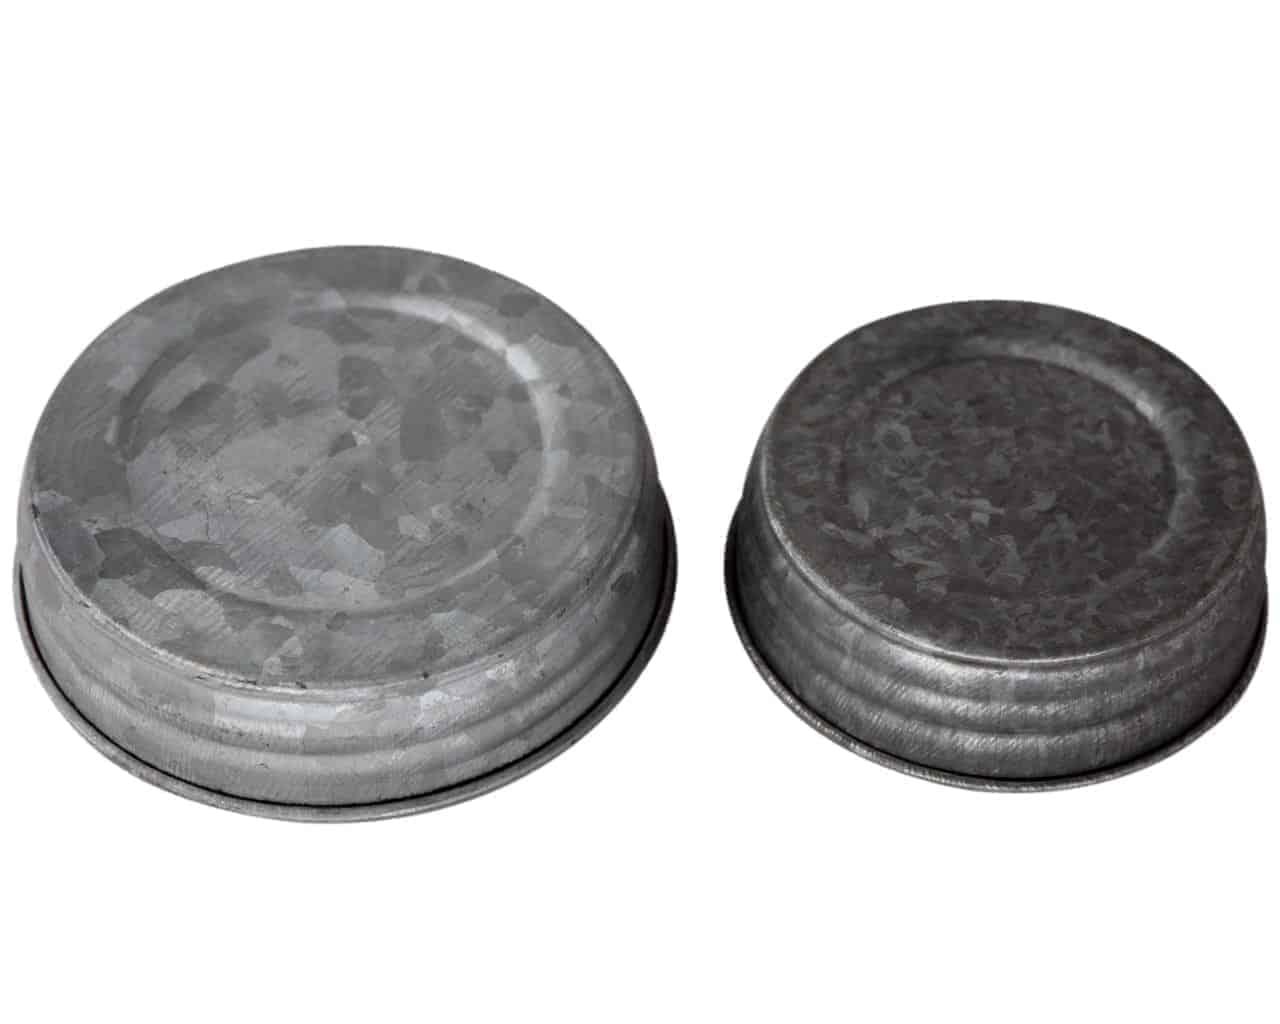 Galvanized Vintage Reproduction Mason Jar Lids 4 Pack